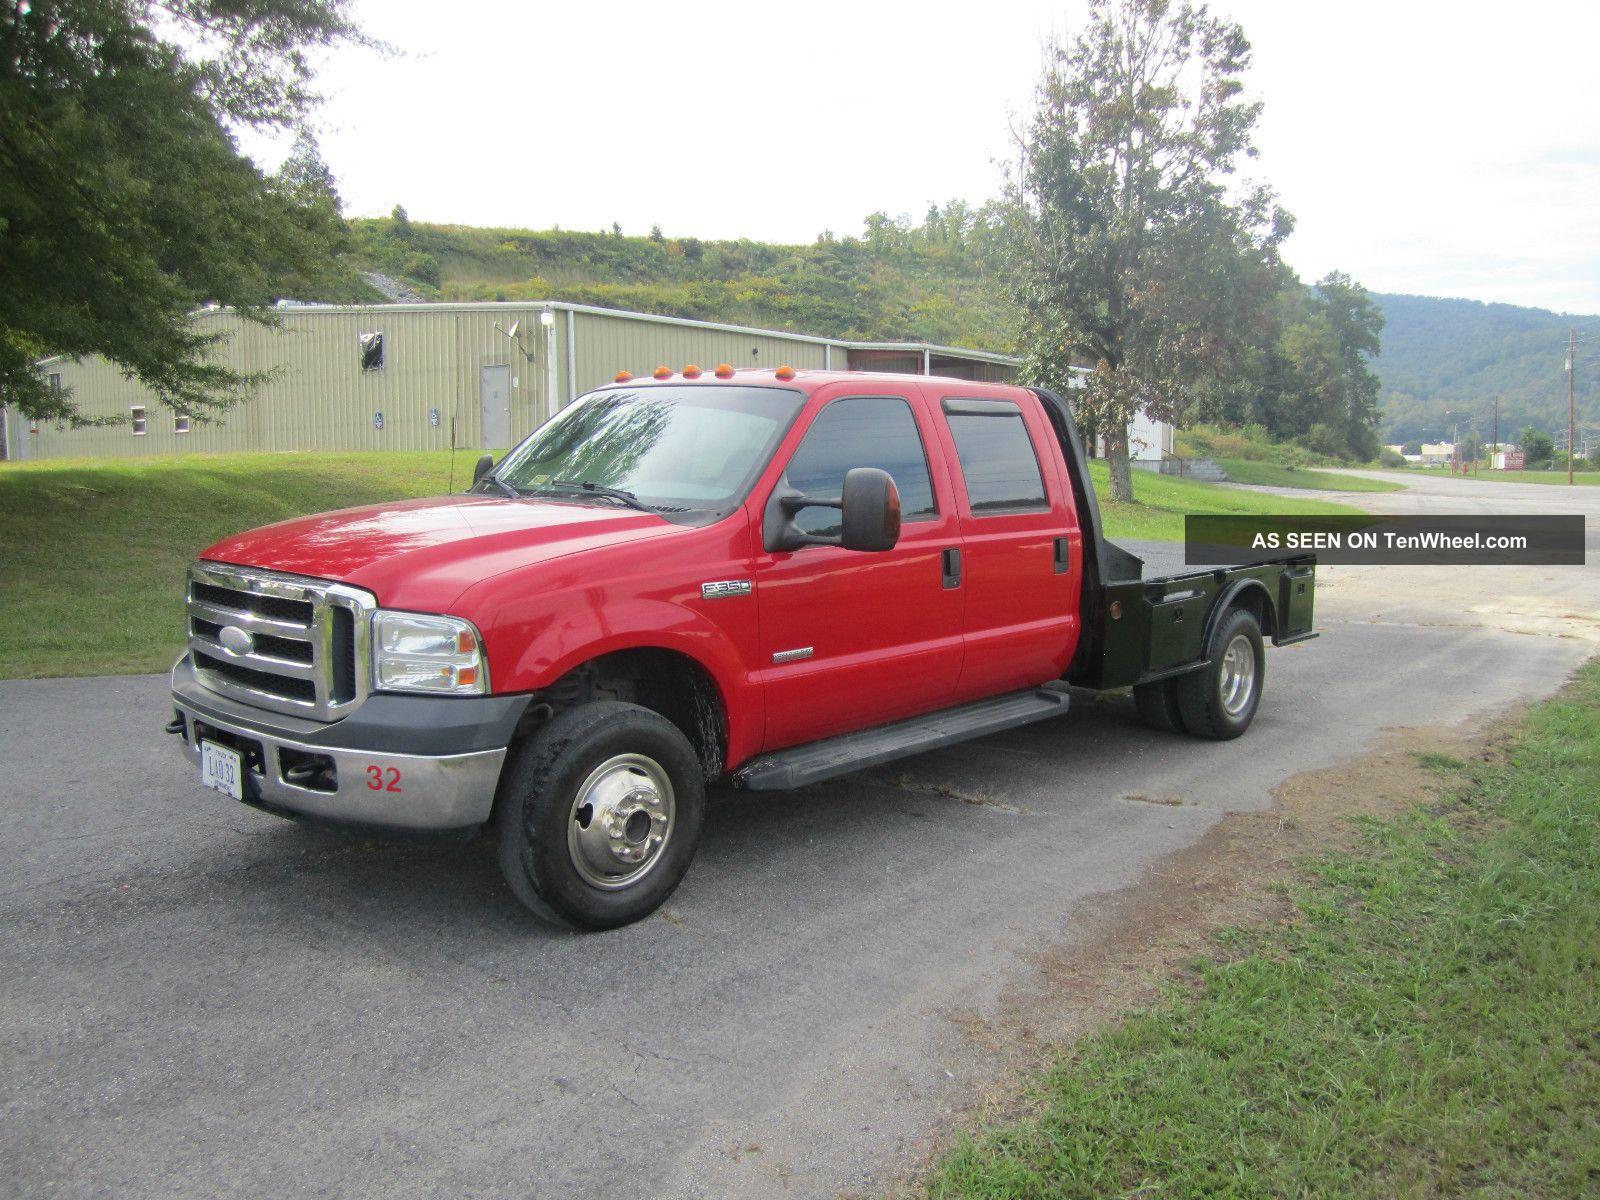 2006 ford f 350 xlt 4x4 drw flatbed crew cab powerstroke diesel. Black Bedroom Furniture Sets. Home Design Ideas